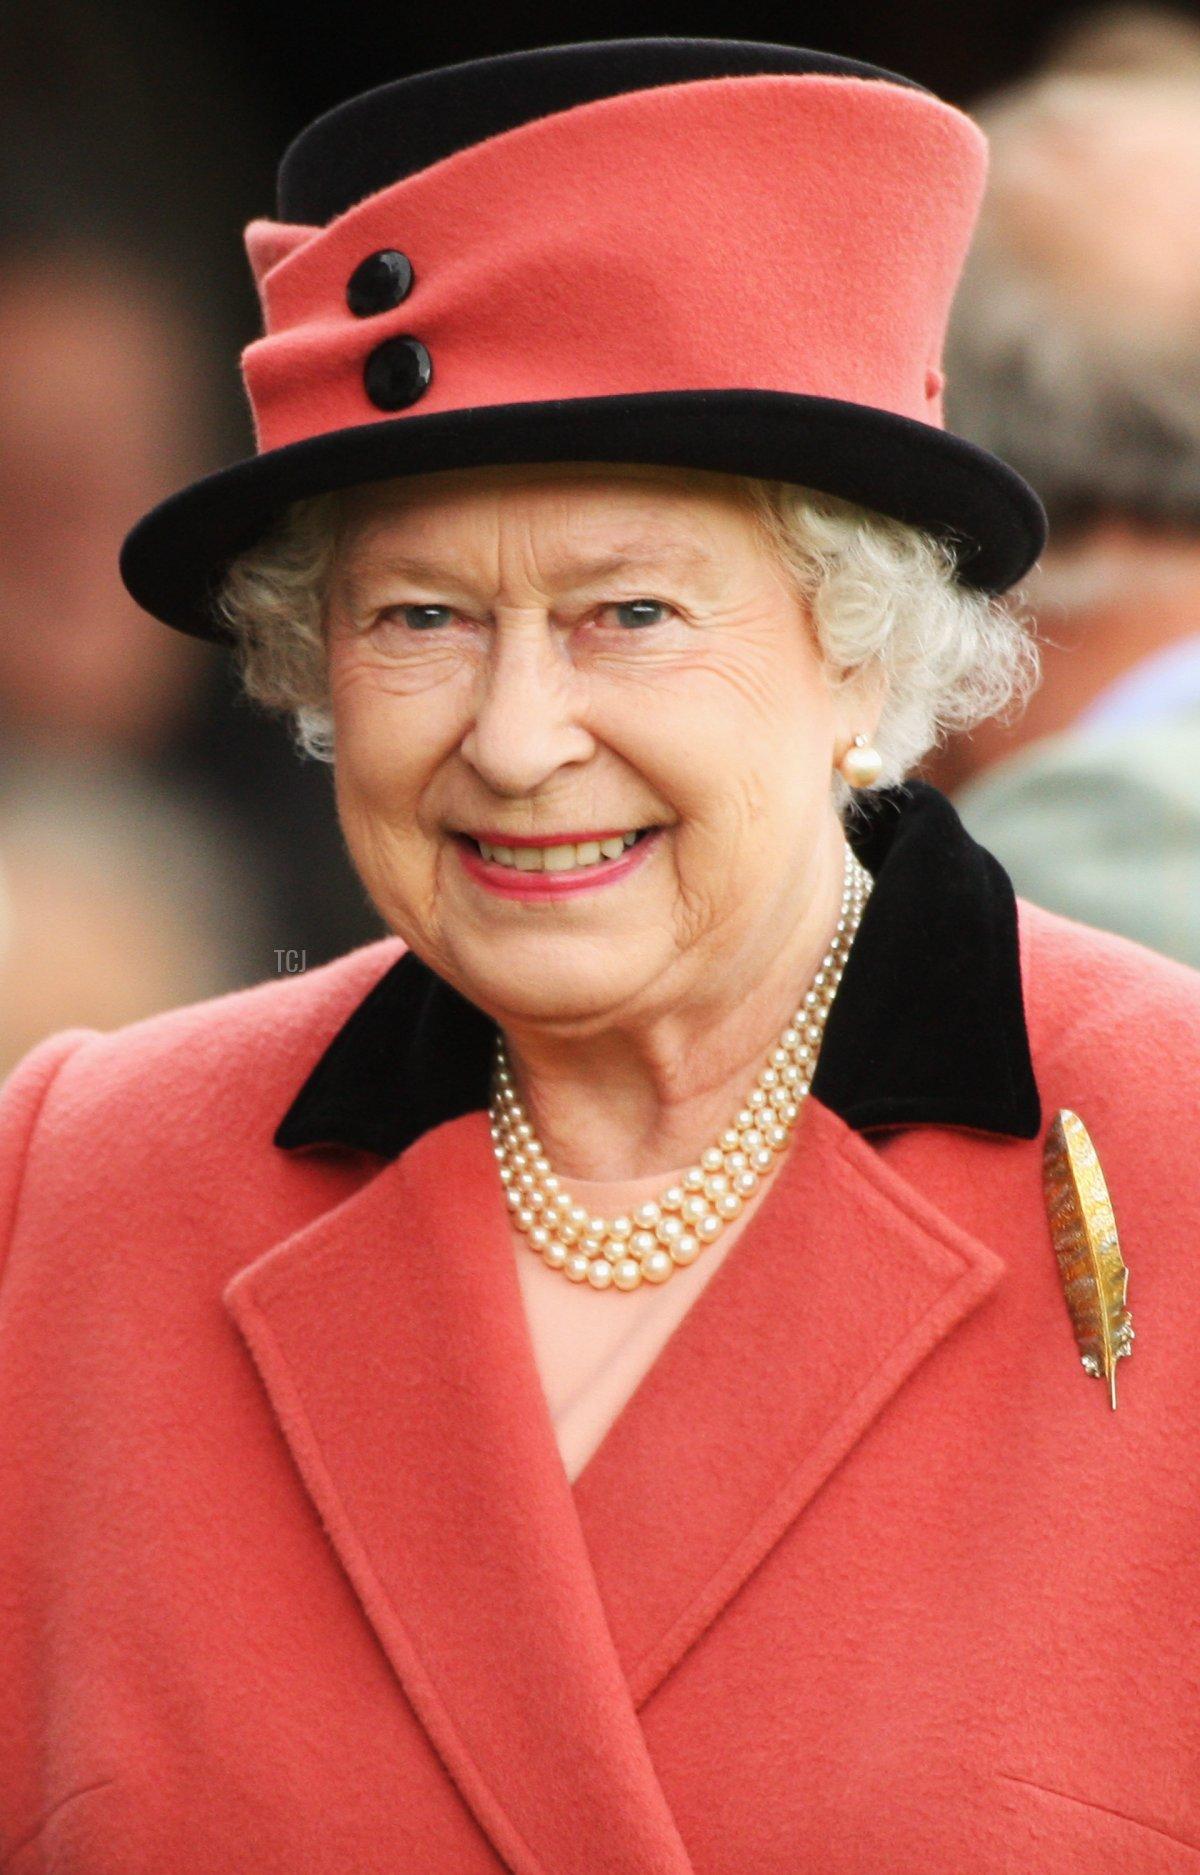 Queen Elizabeth II attends the Annual Braemar Highland Gathering on September 6, 2008 in Braemar, Scotland